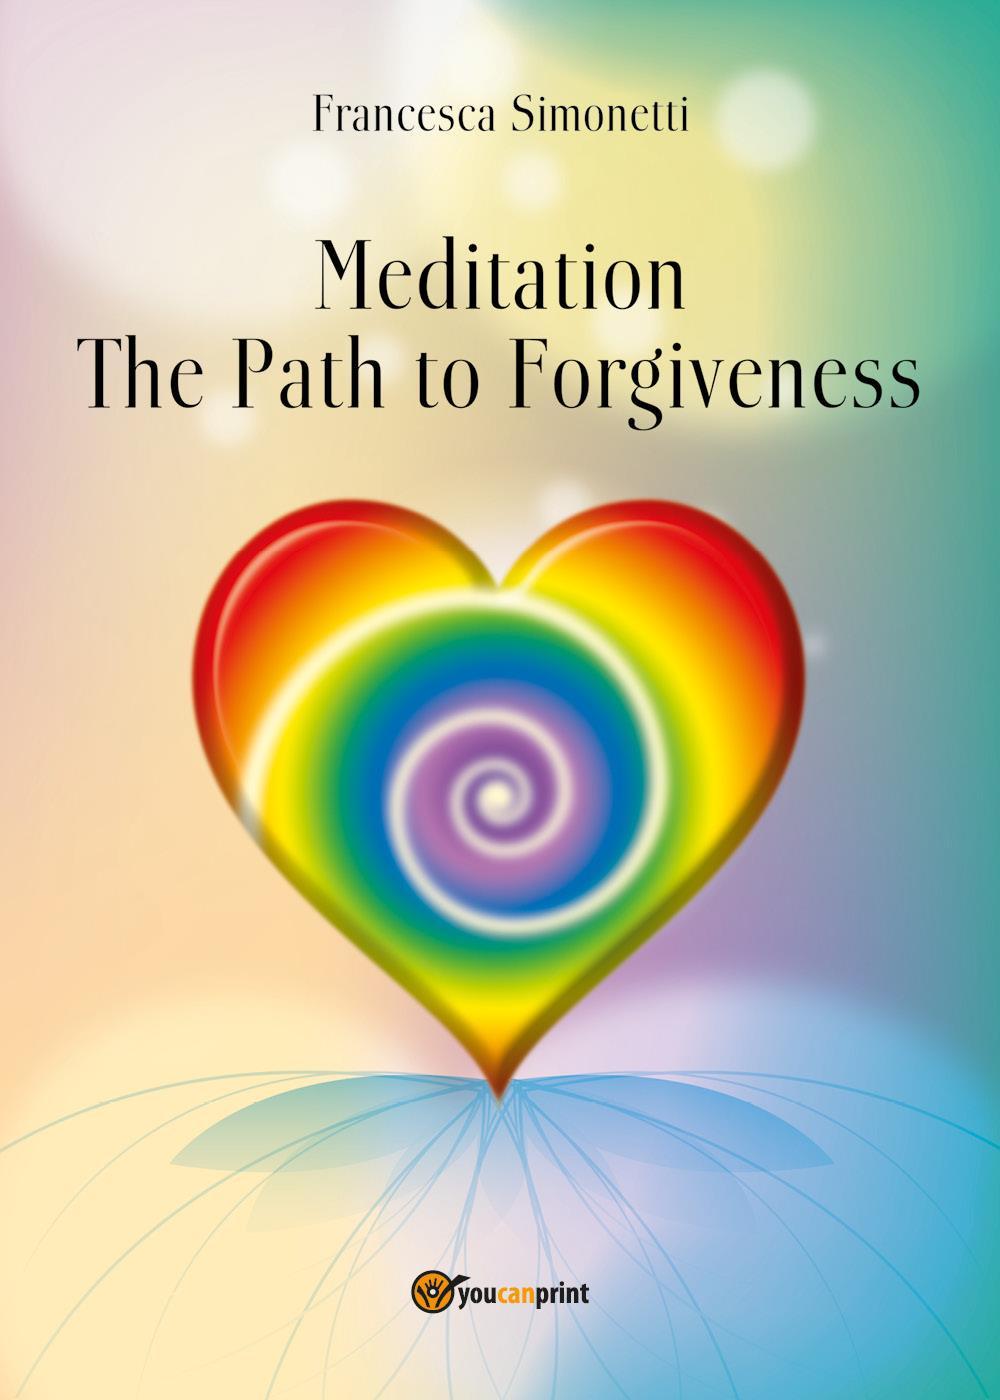 MEDITATION - The Path to Forgiveness